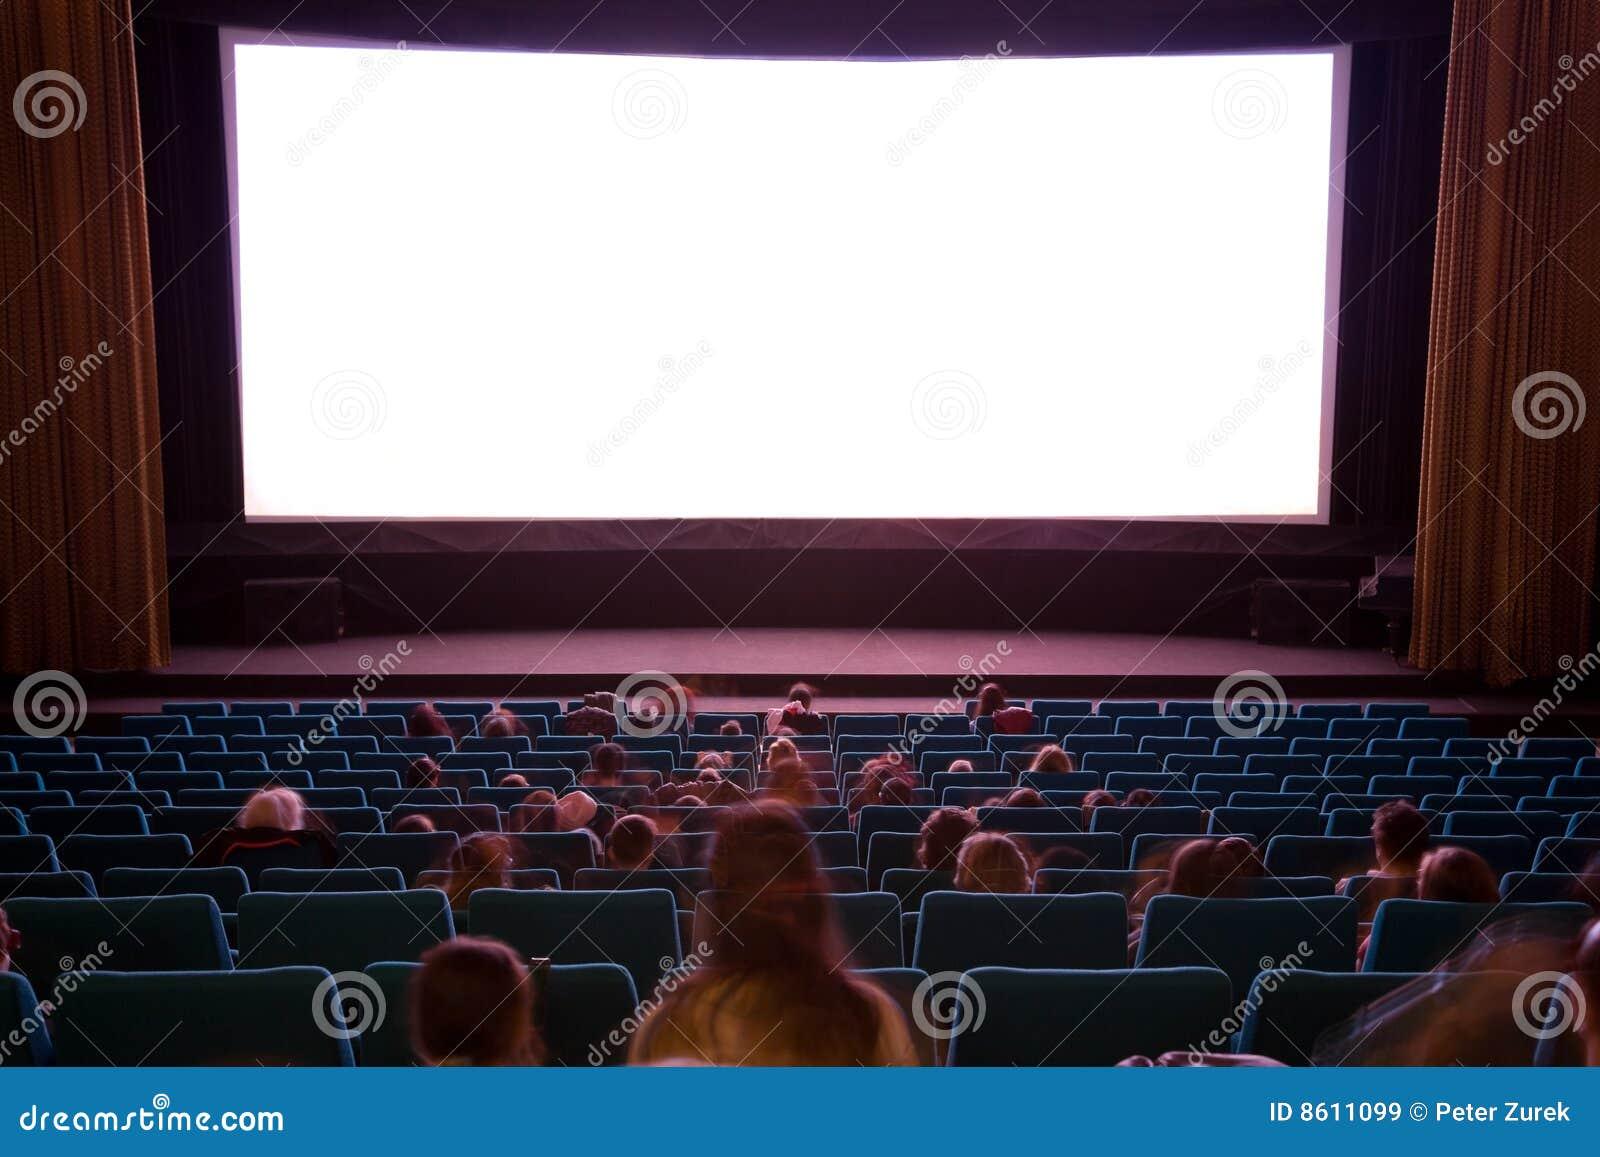 Cinema interior with people